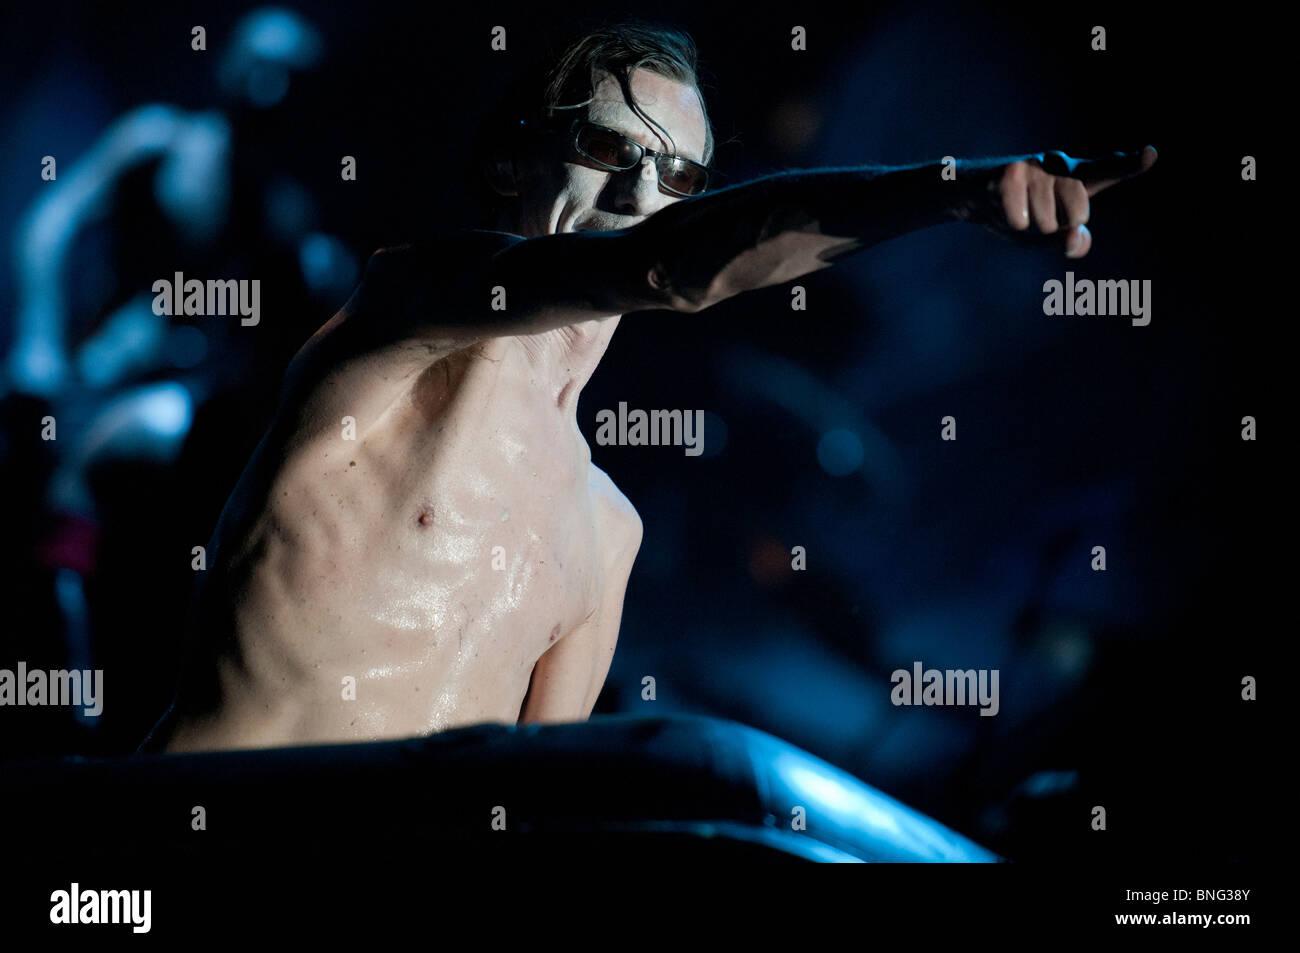 Christian 'Doctor Flake' Lorenz, Rammstein keyboarder - Stock Image